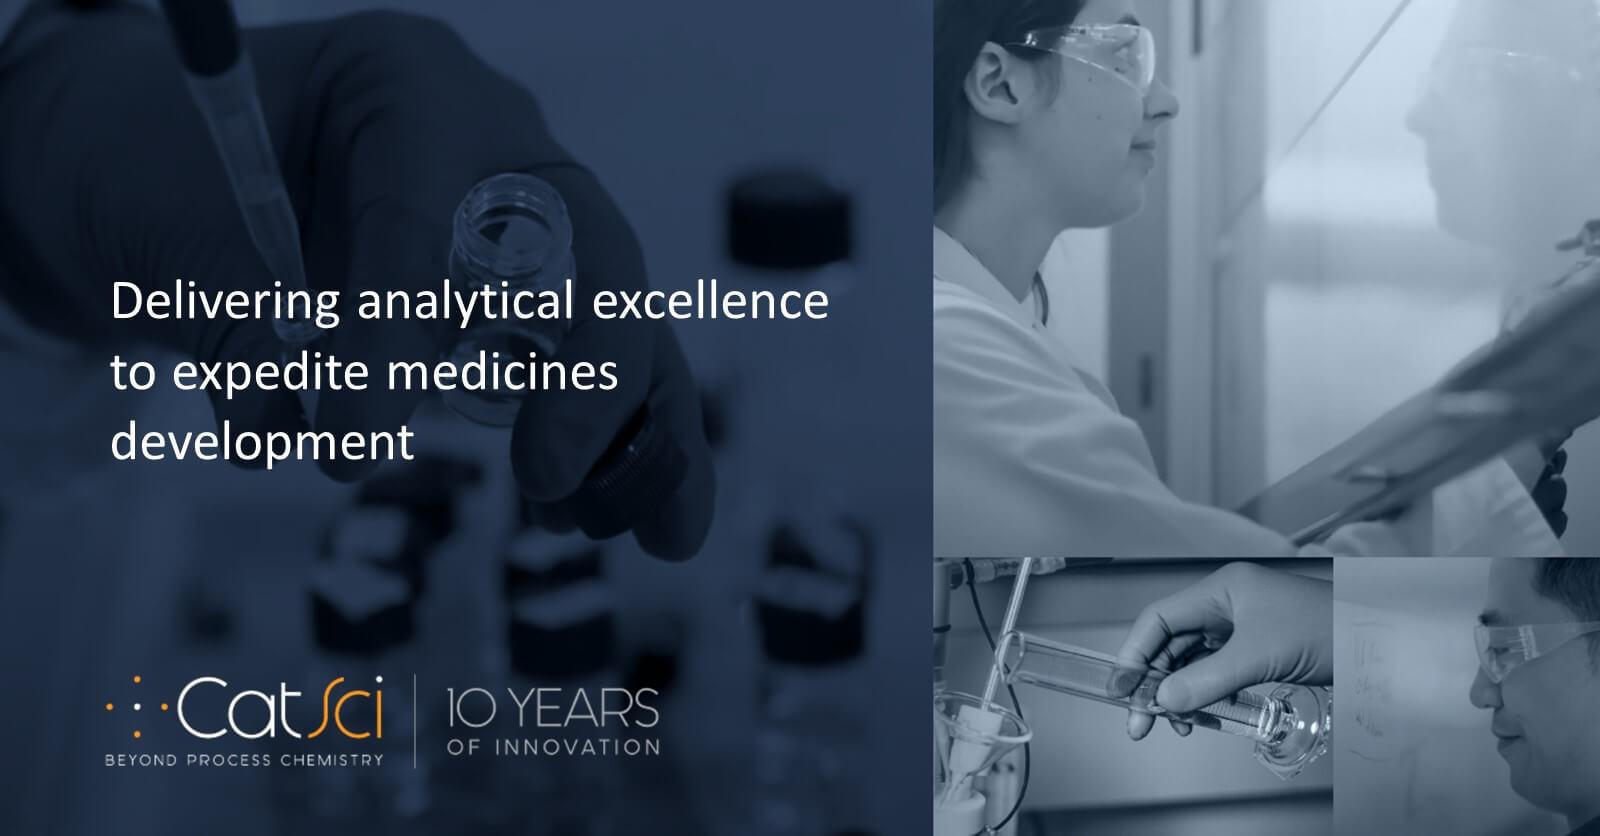 CatSci opens new Dagenham laboratory dedicated to analytical excellence